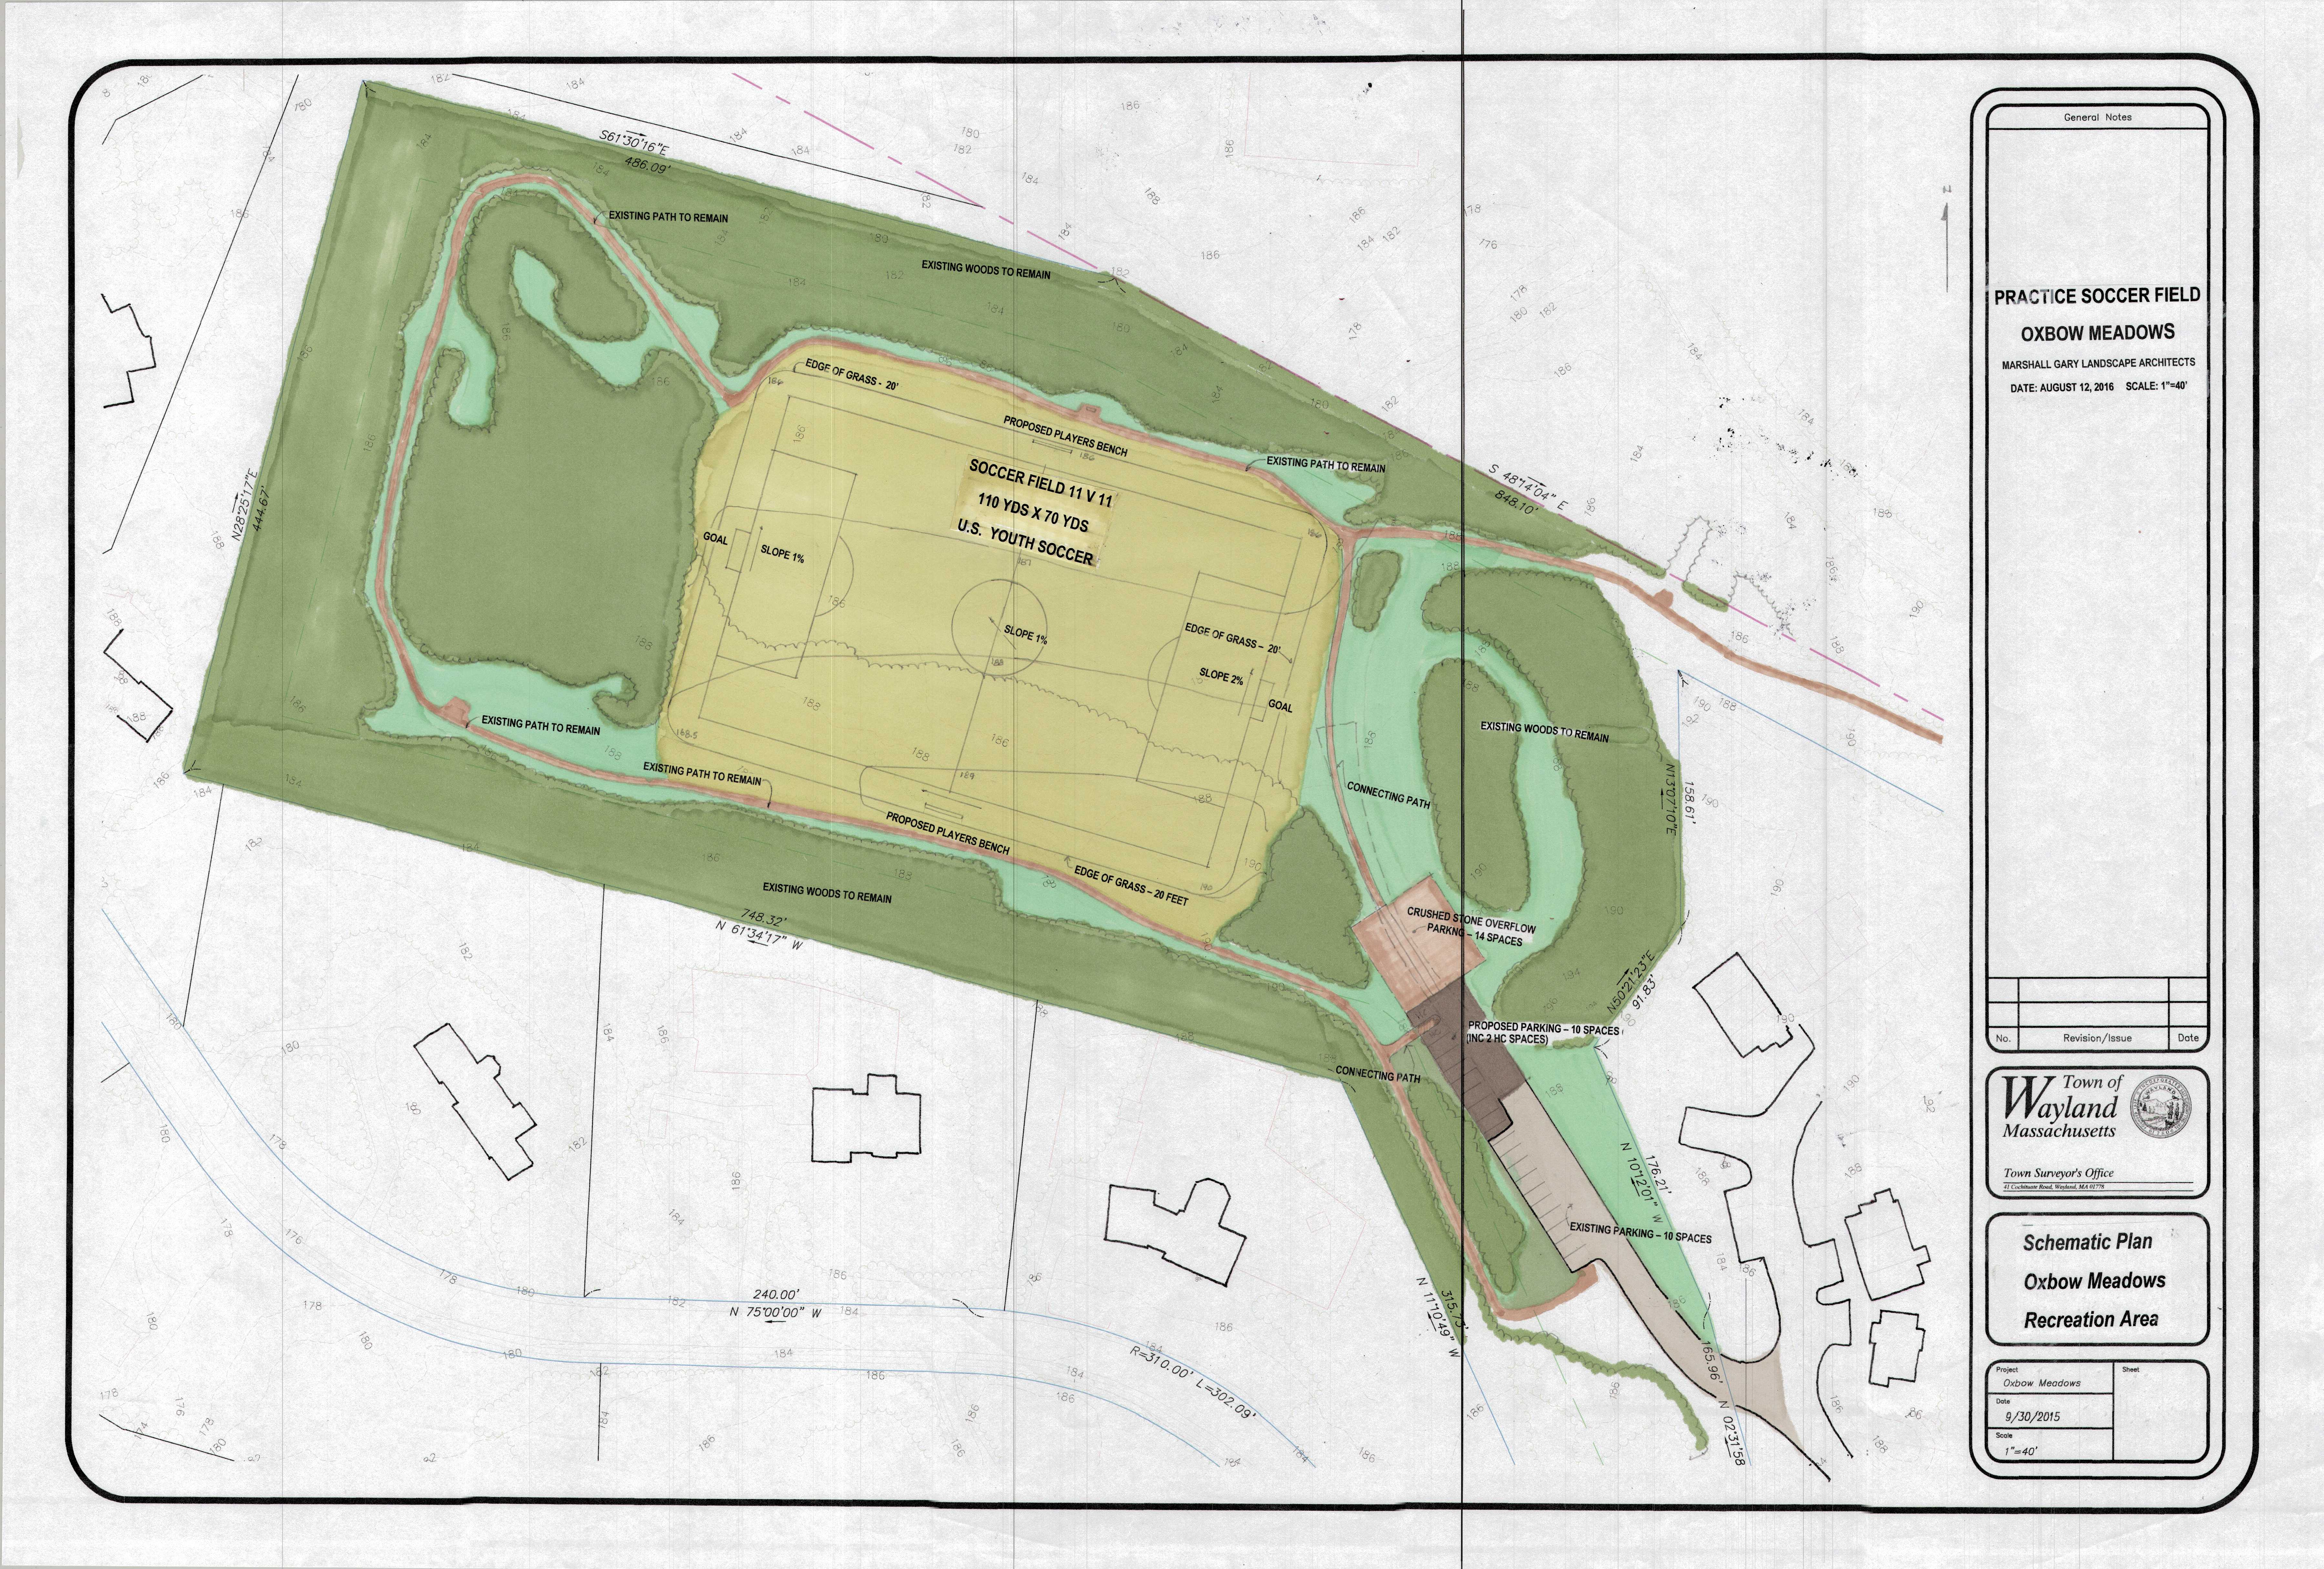 Oxbow Meadows Field Development | waylandrec.com